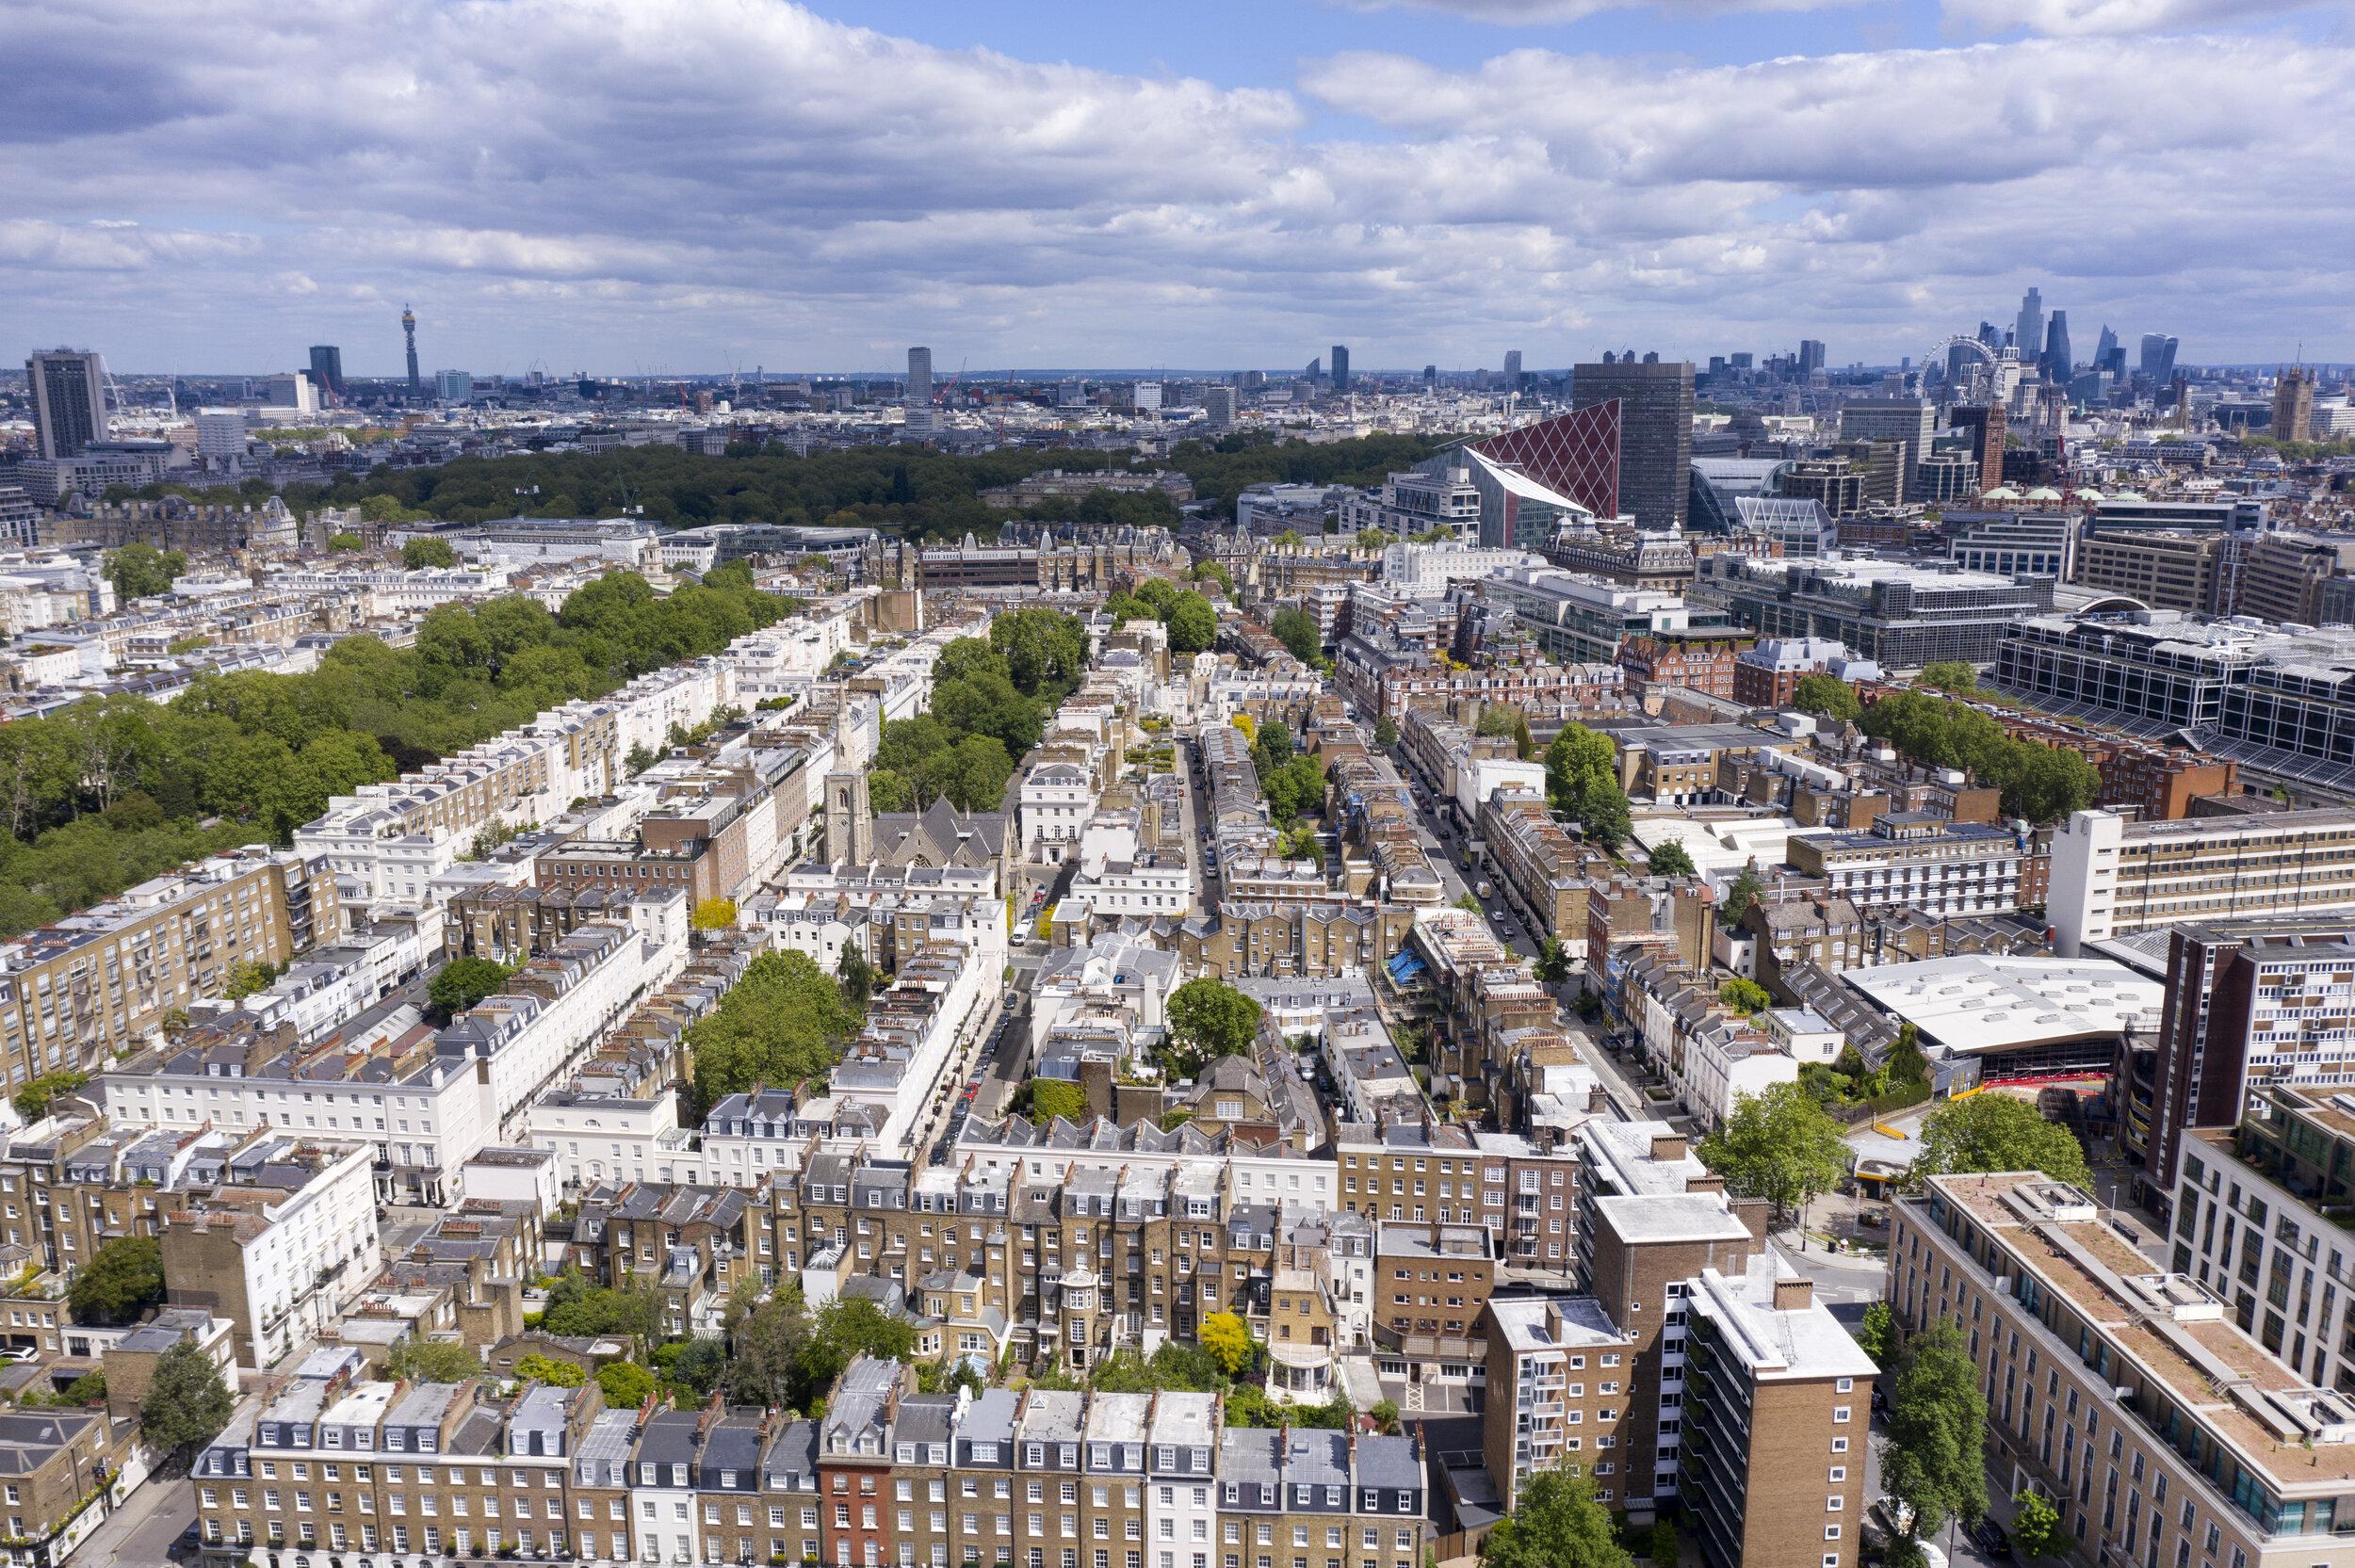 FrancisHollandSchool-London-Drone.jpg